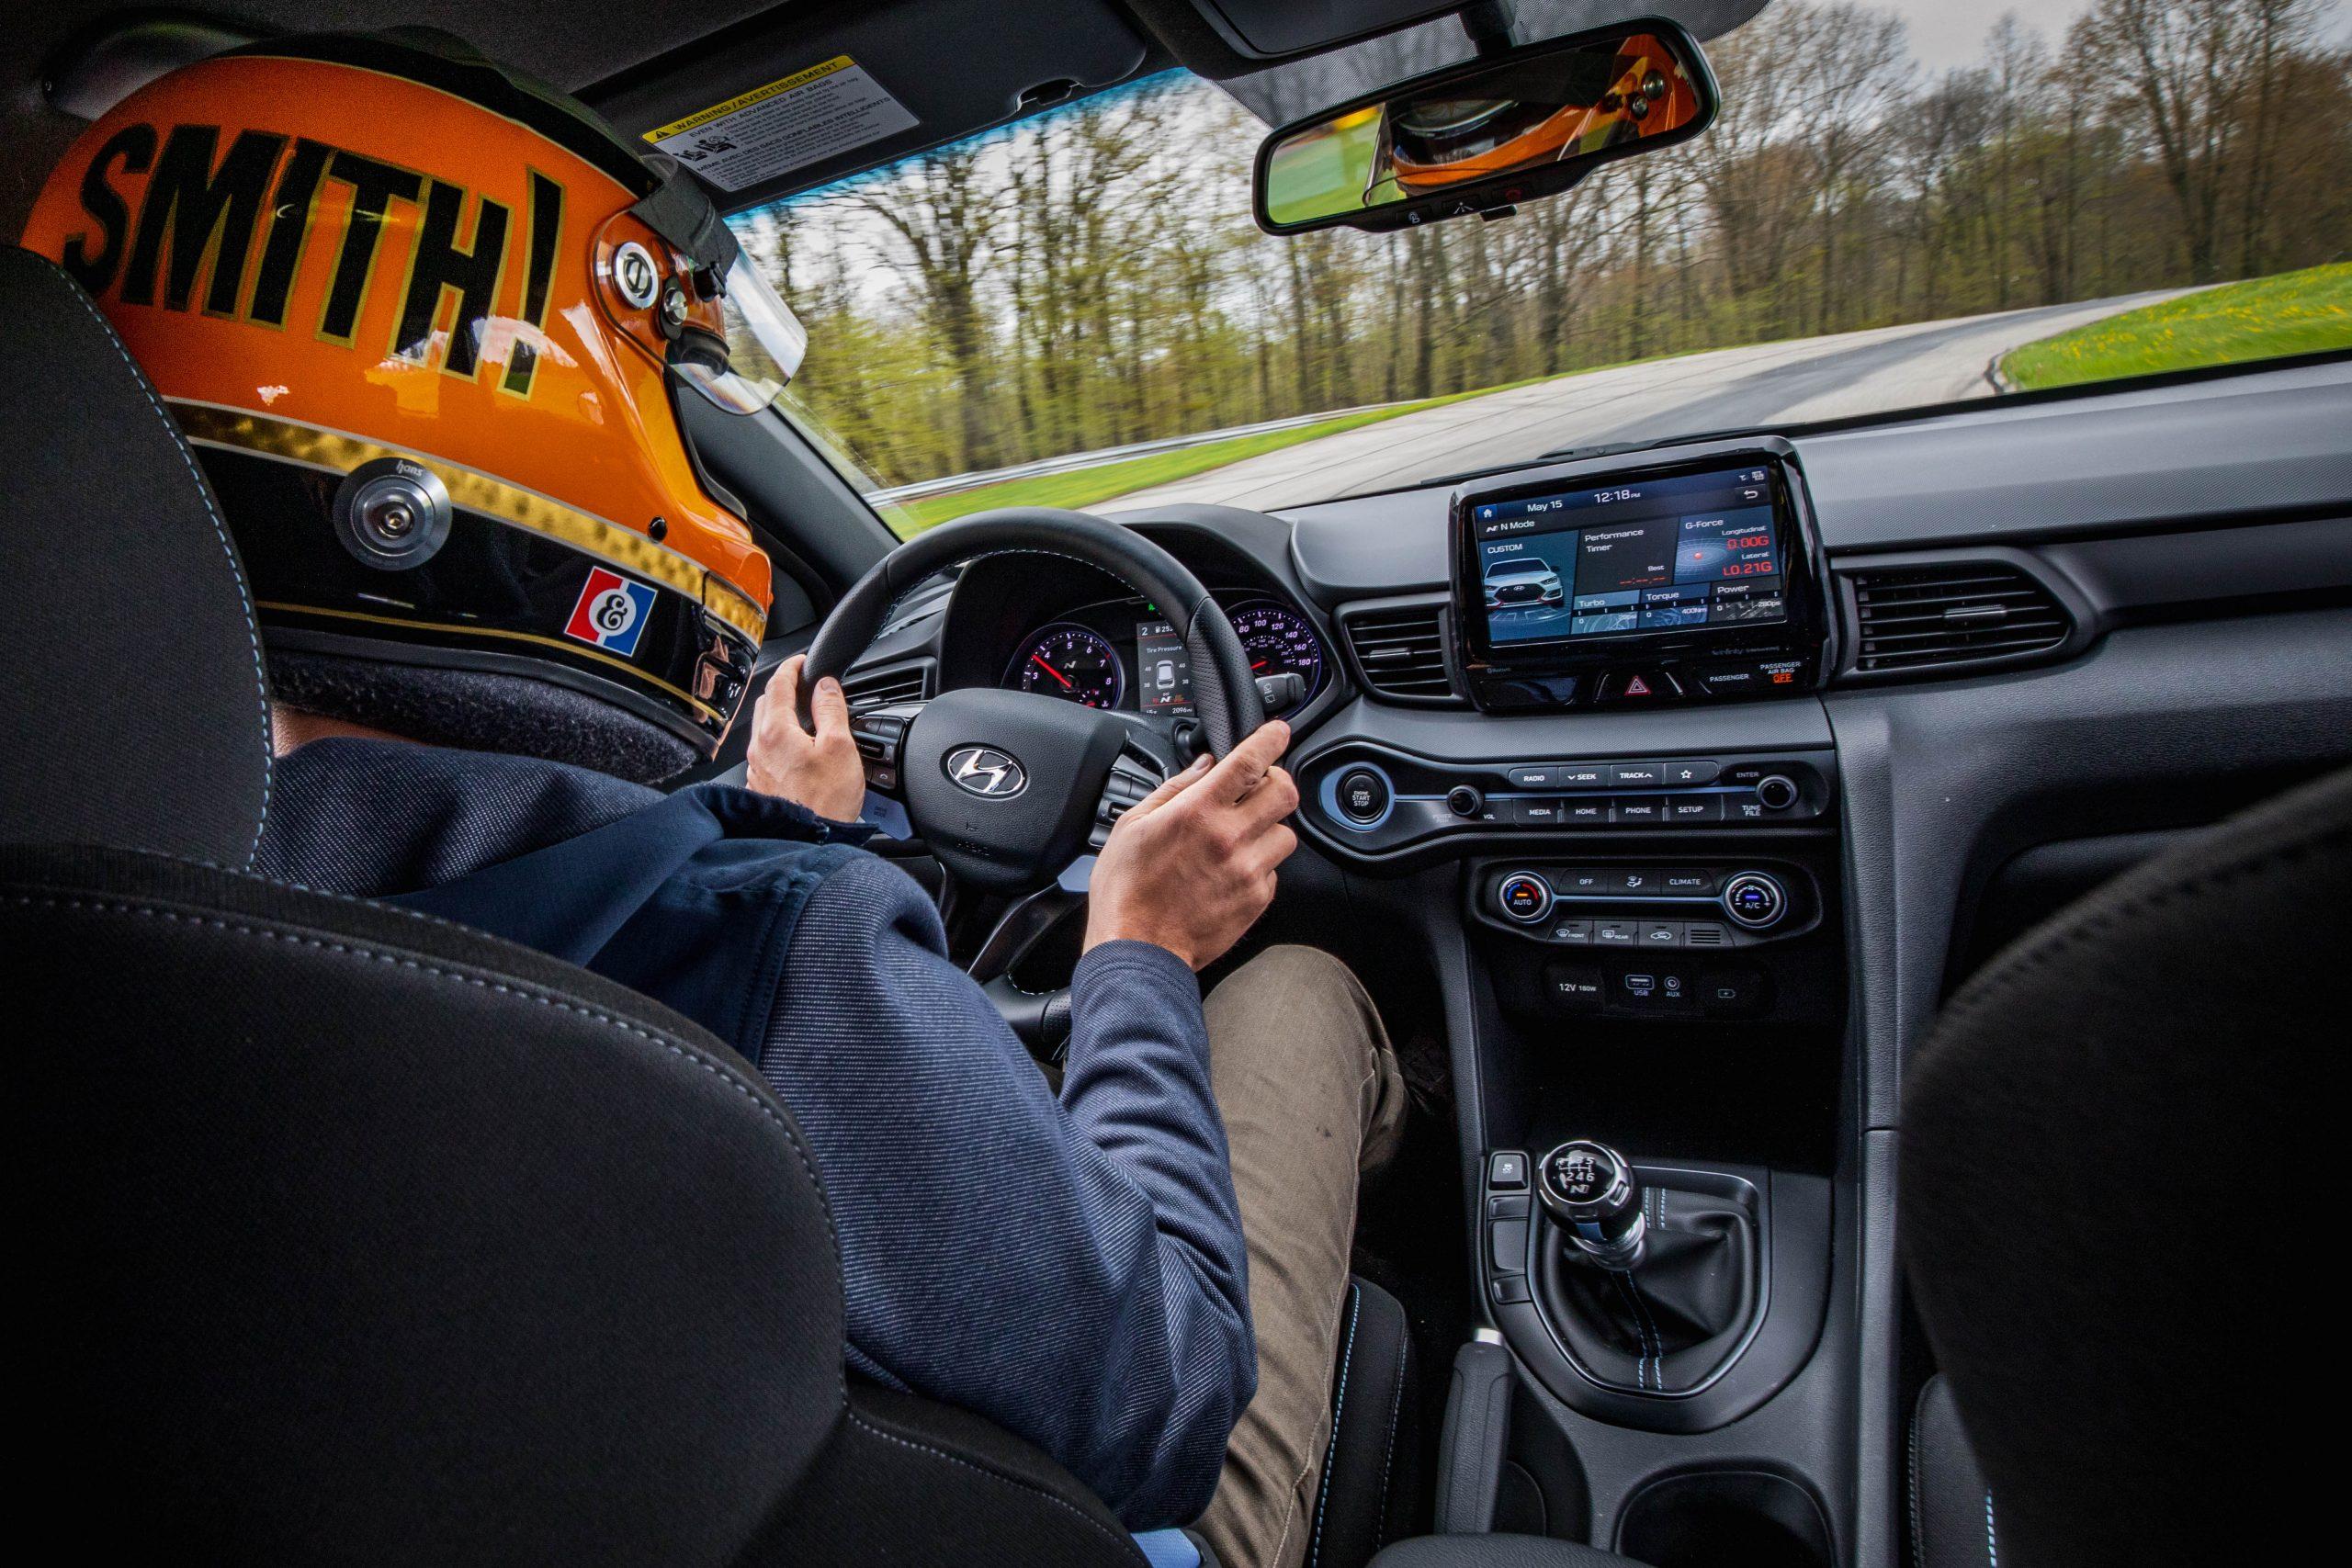 2020 Hyundai Veloster N interior track